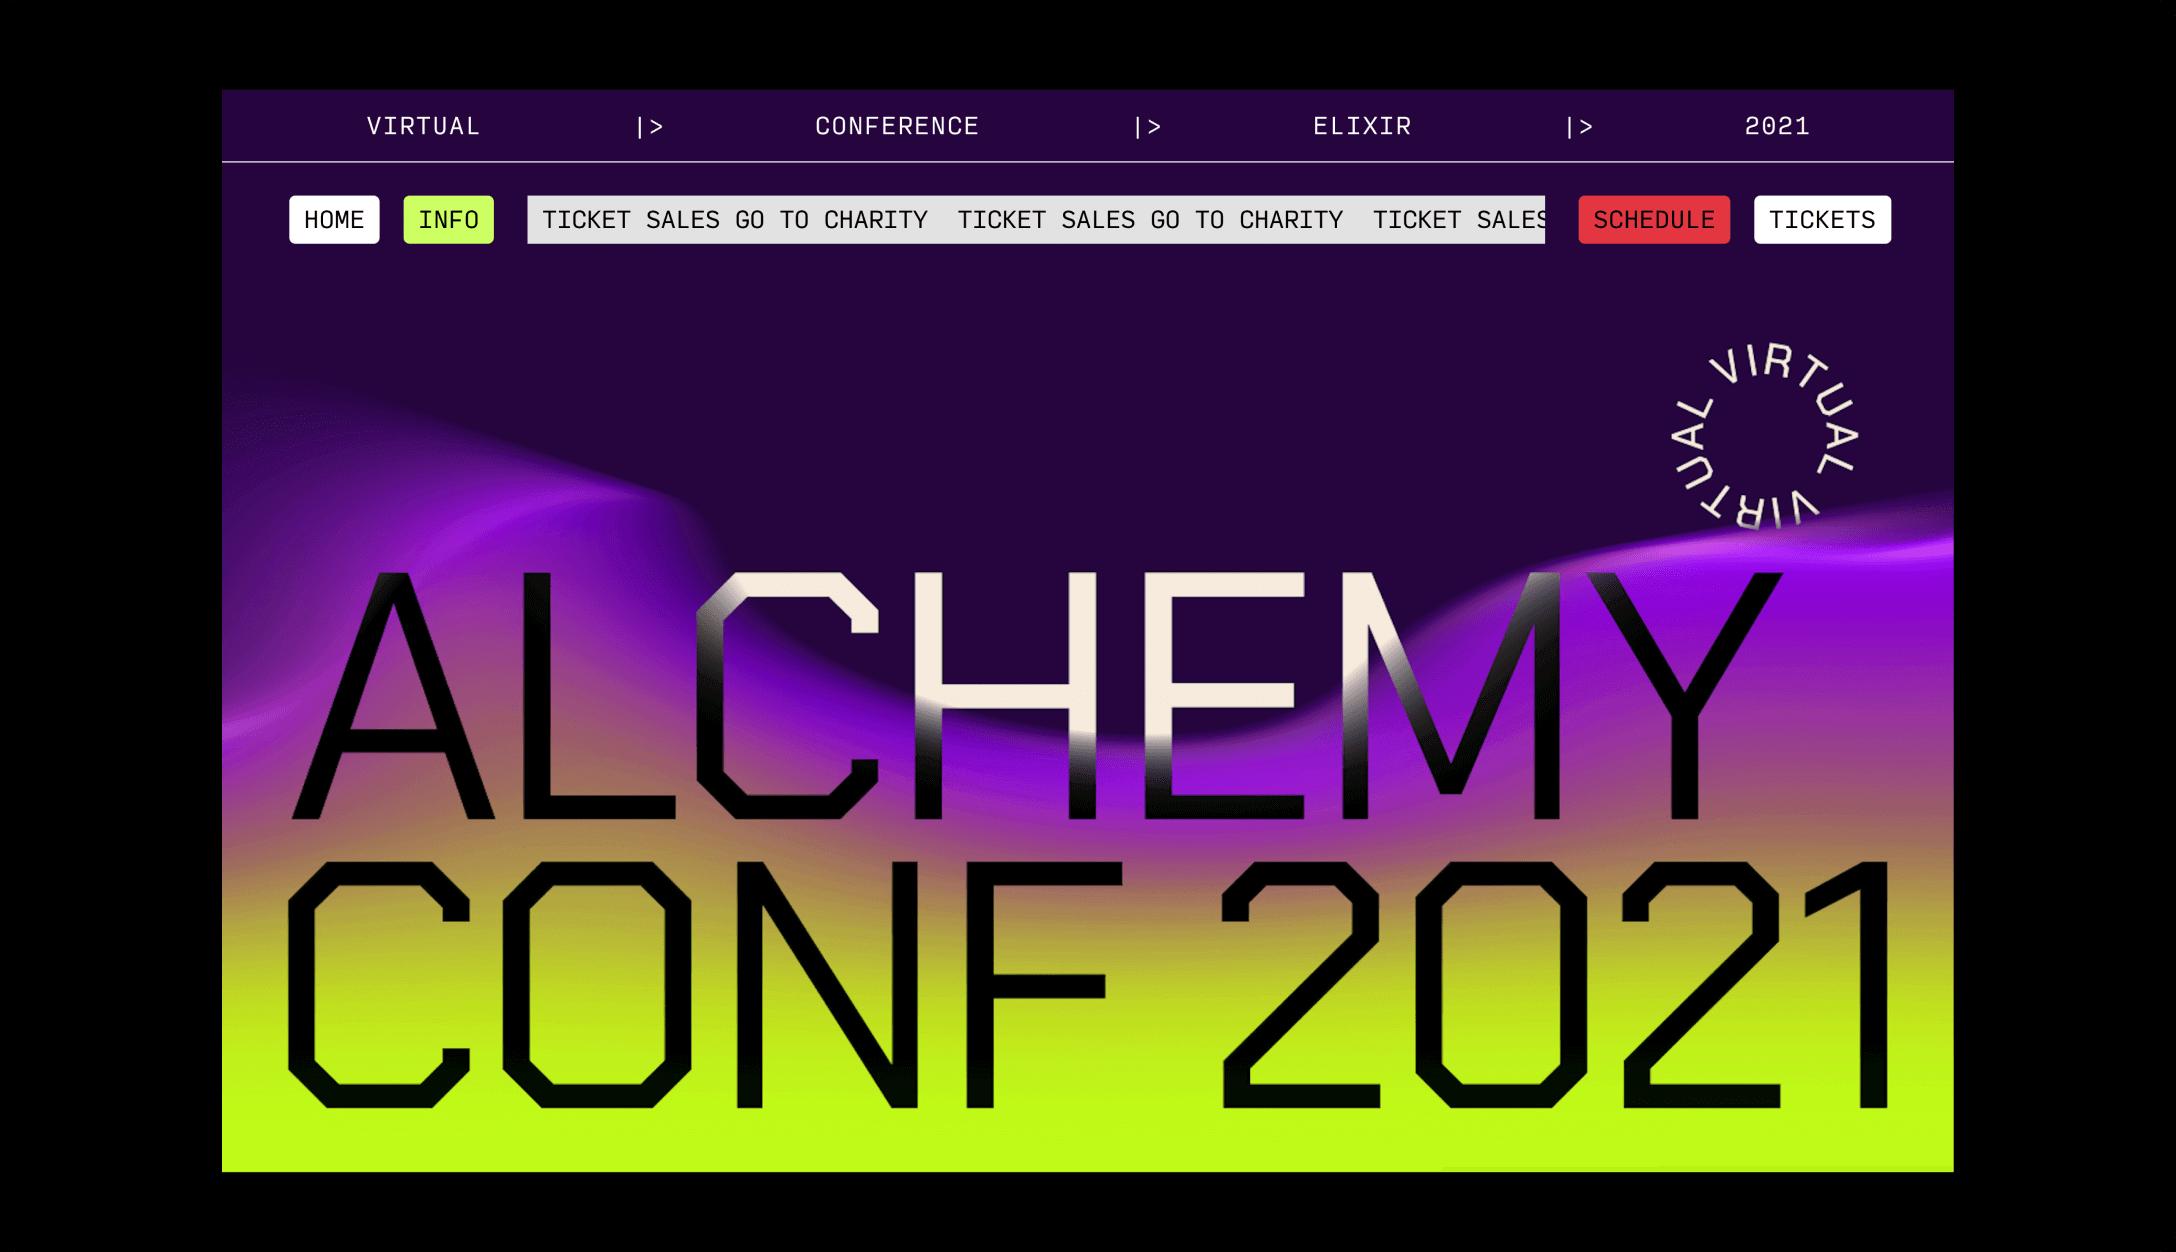 Alchemy Conf 2021